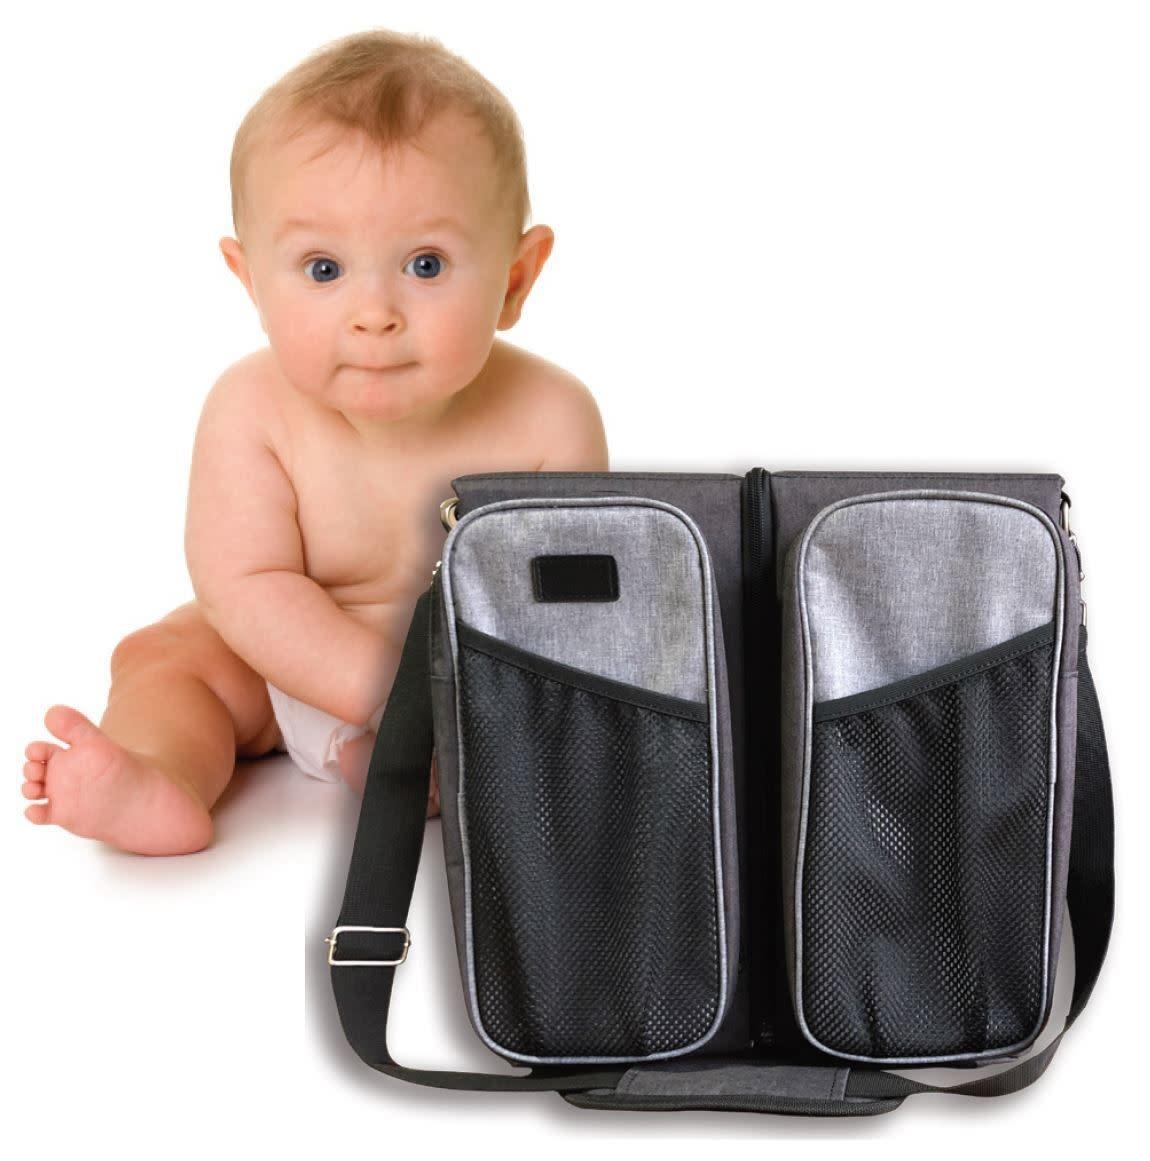 La Tasche La Tasche All In One - Baby Station Black